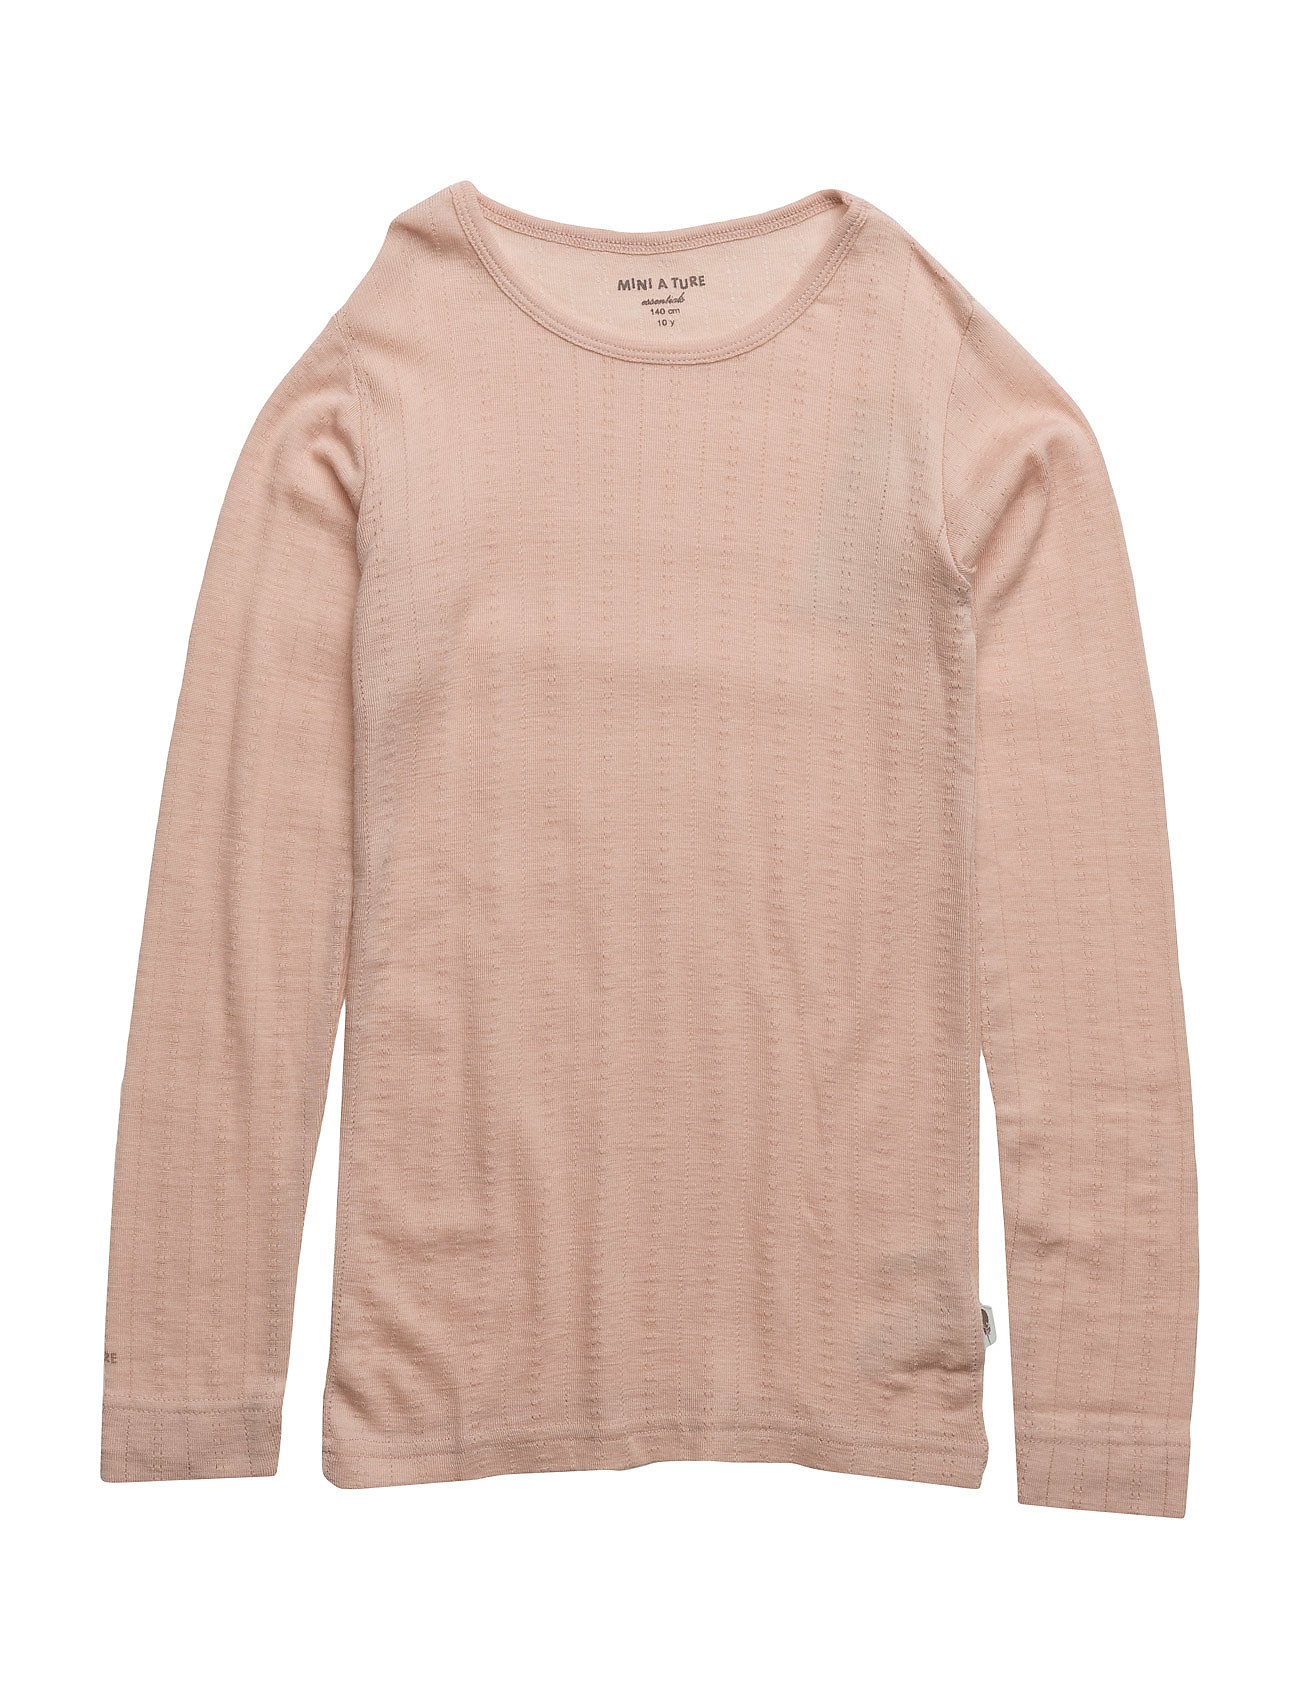 Mini A Ture Eddy T-shirt, MK - ROSE DUST